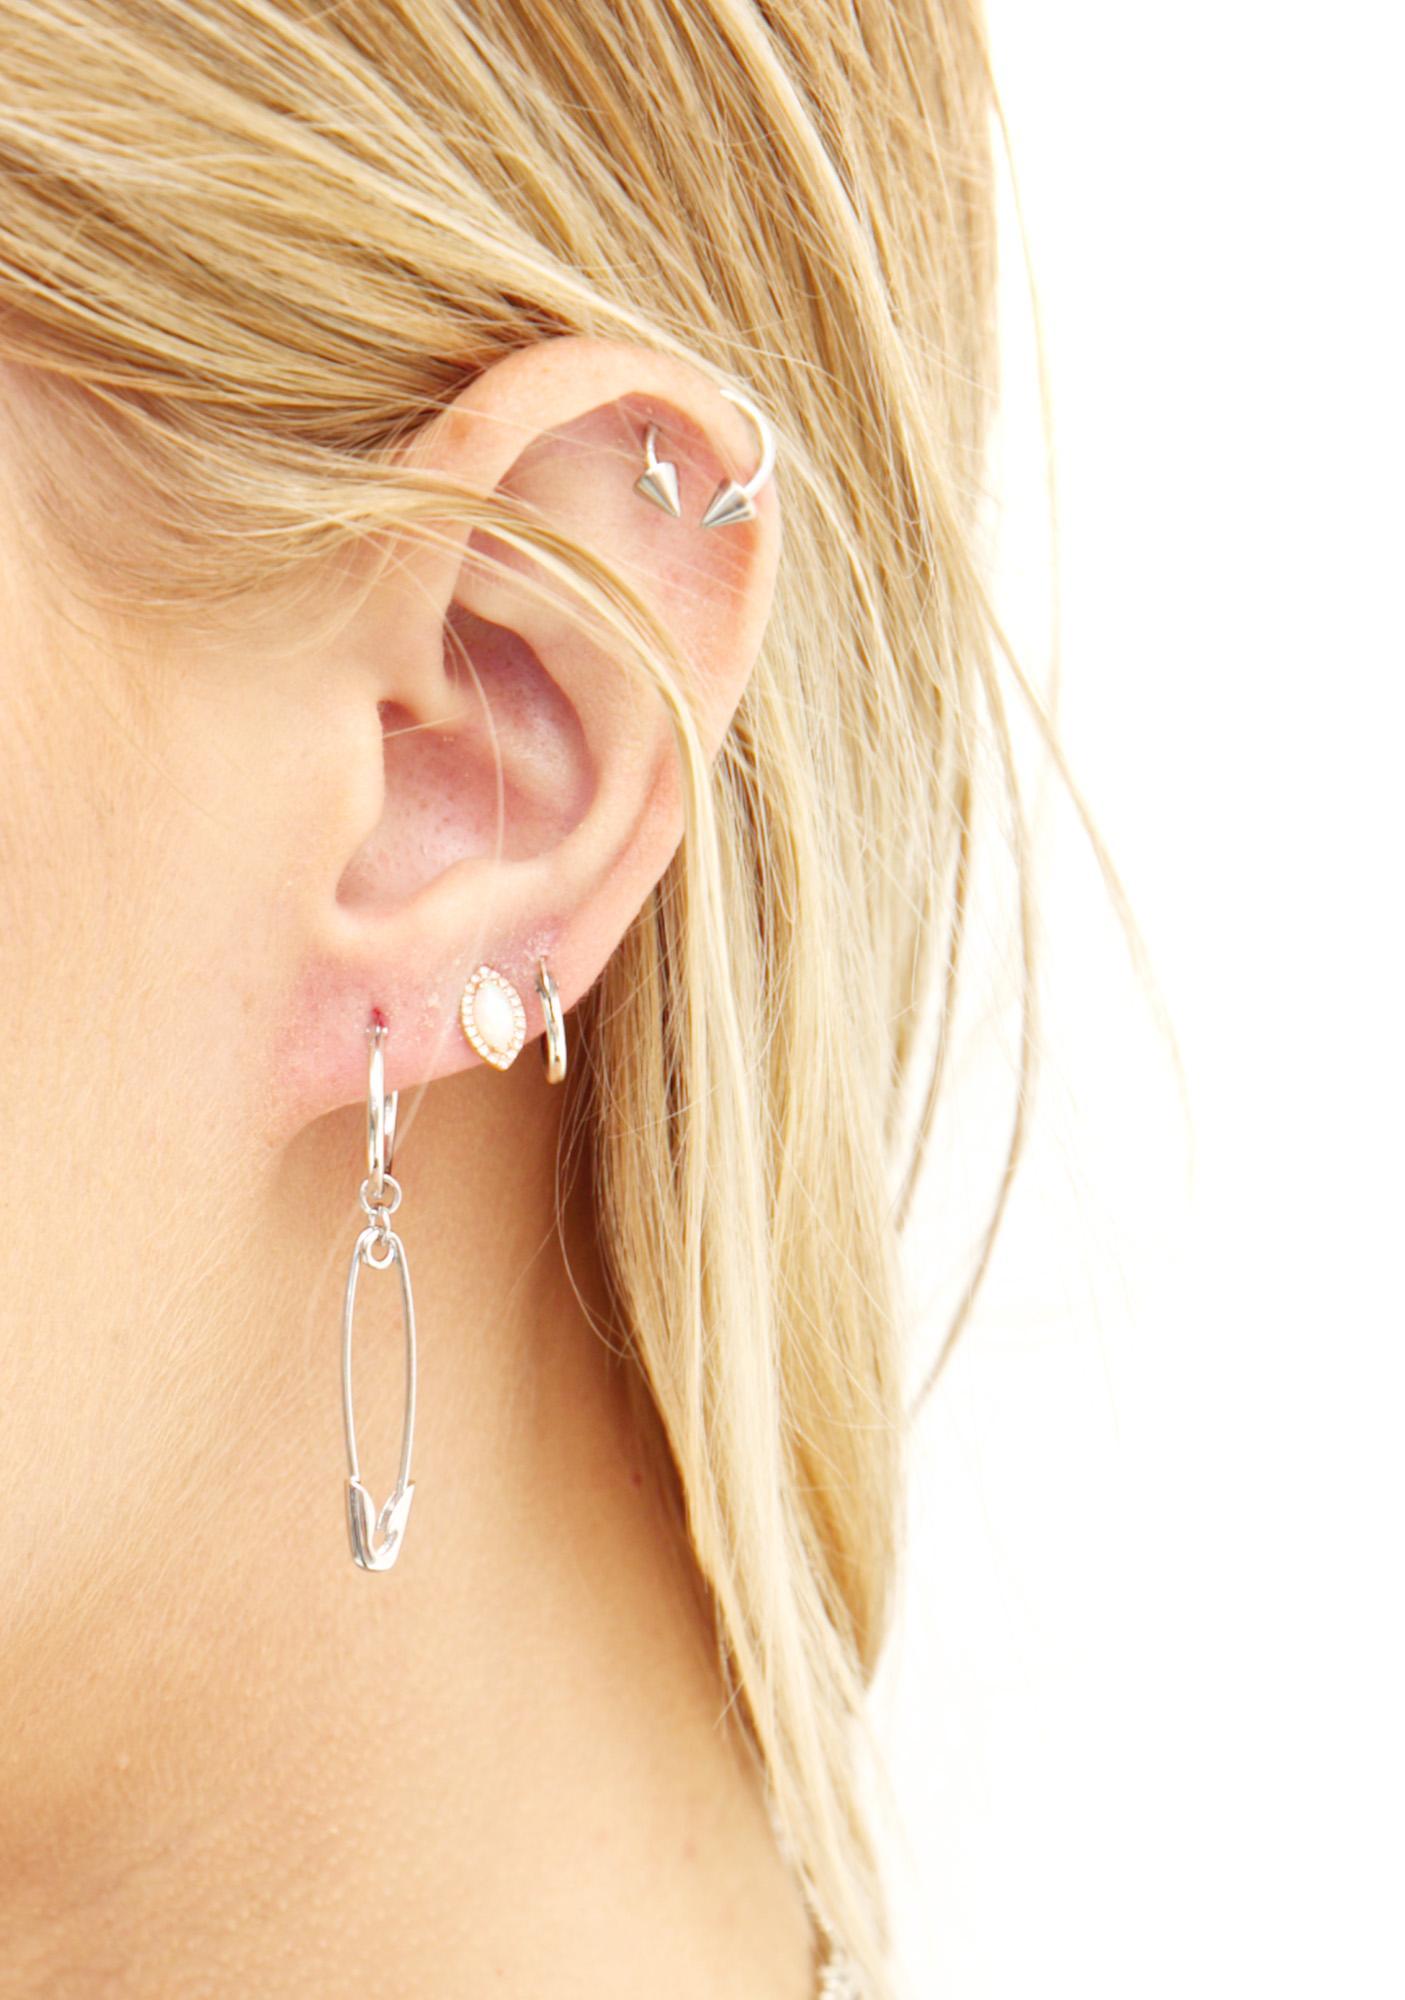 Eyland Jewellery Aragon Earrings